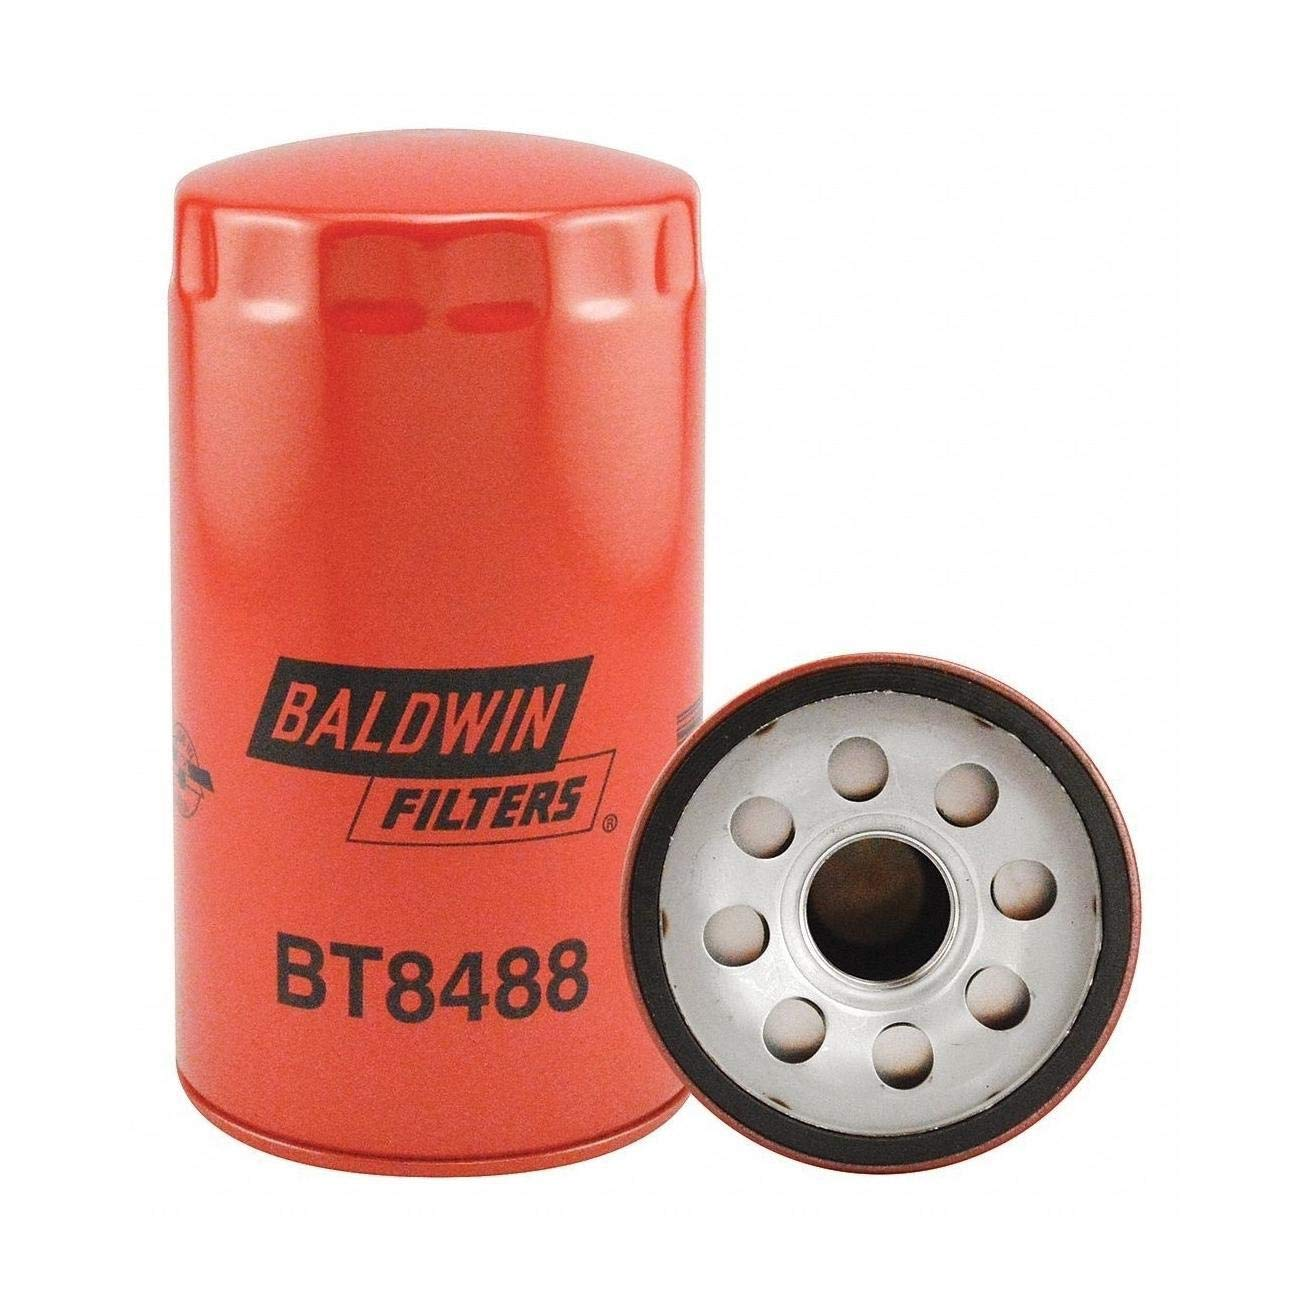 Baldwin Heavy Duty BT8488 Hydraulic Spin-On Filter Filter